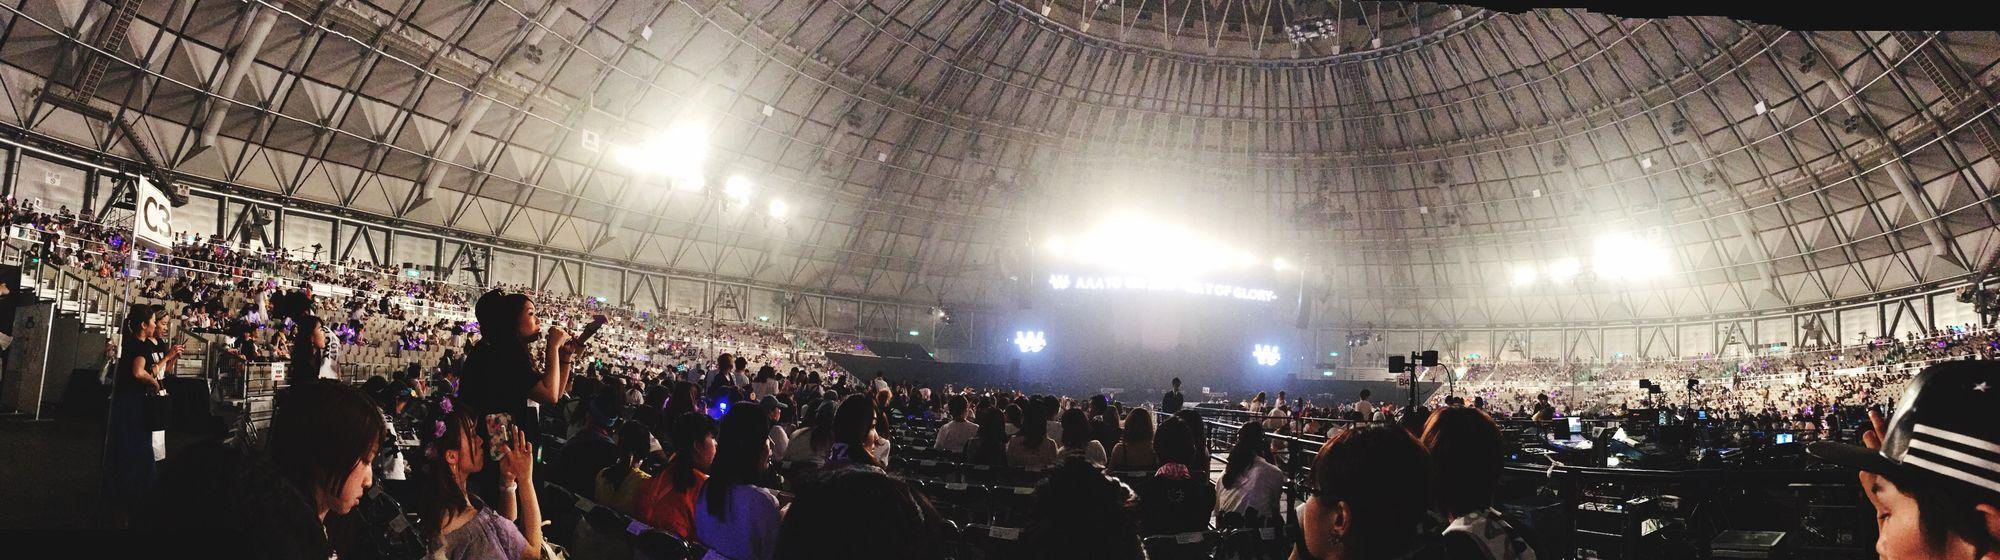 (06/24) AAA ARENA TOUR 2017 -WAY OF GLORY- WOG